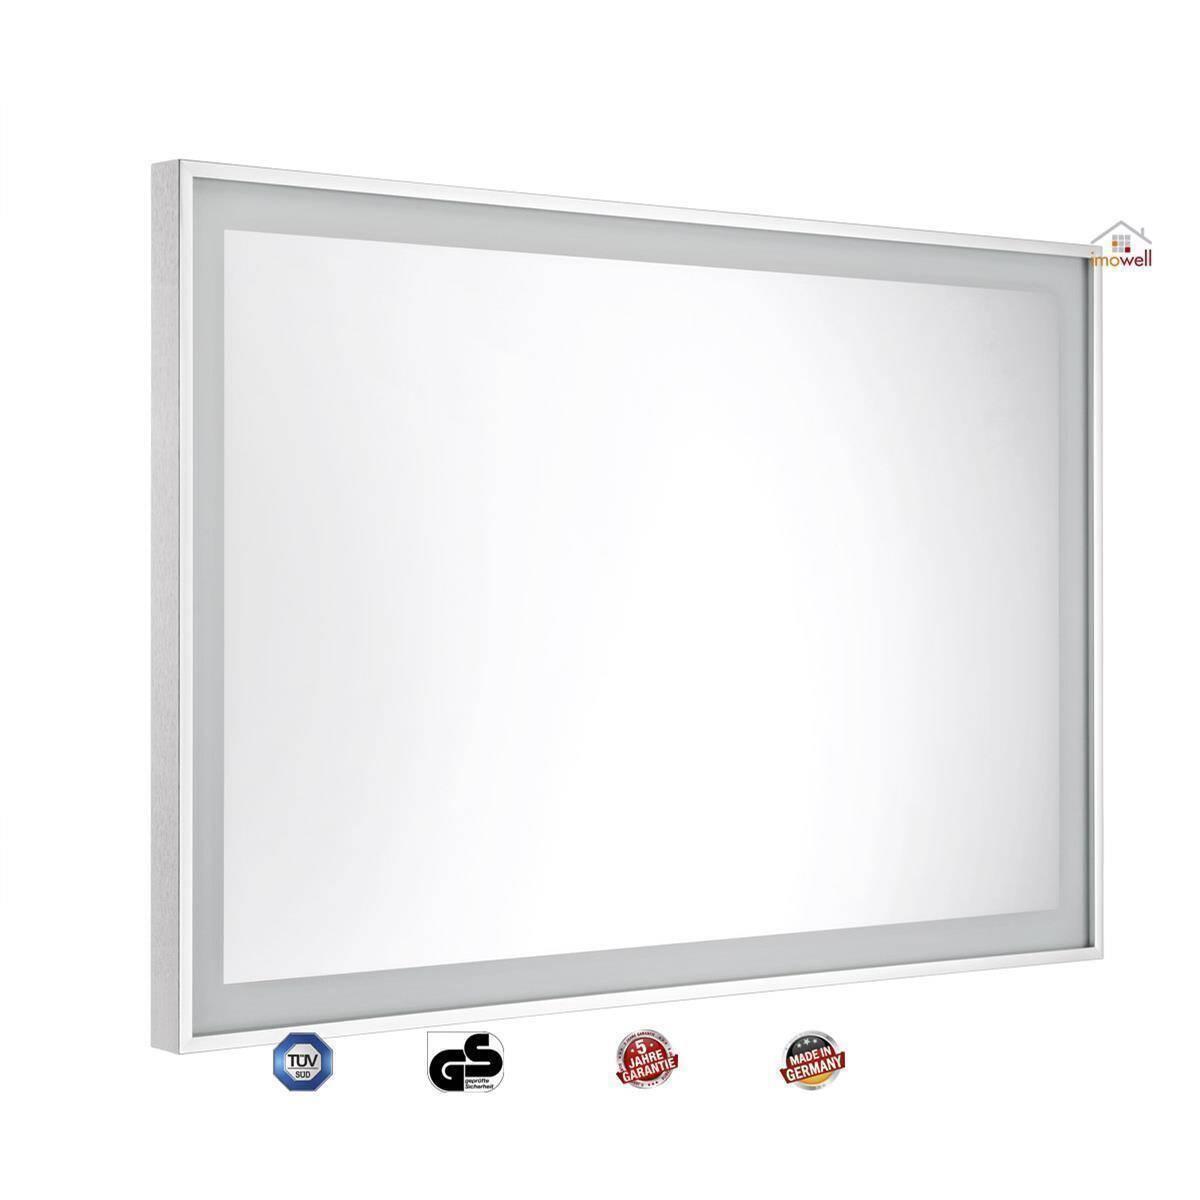 infrarot spiegelheizung nomic halo 400 watt mit led. Black Bedroom Furniture Sets. Home Design Ideas